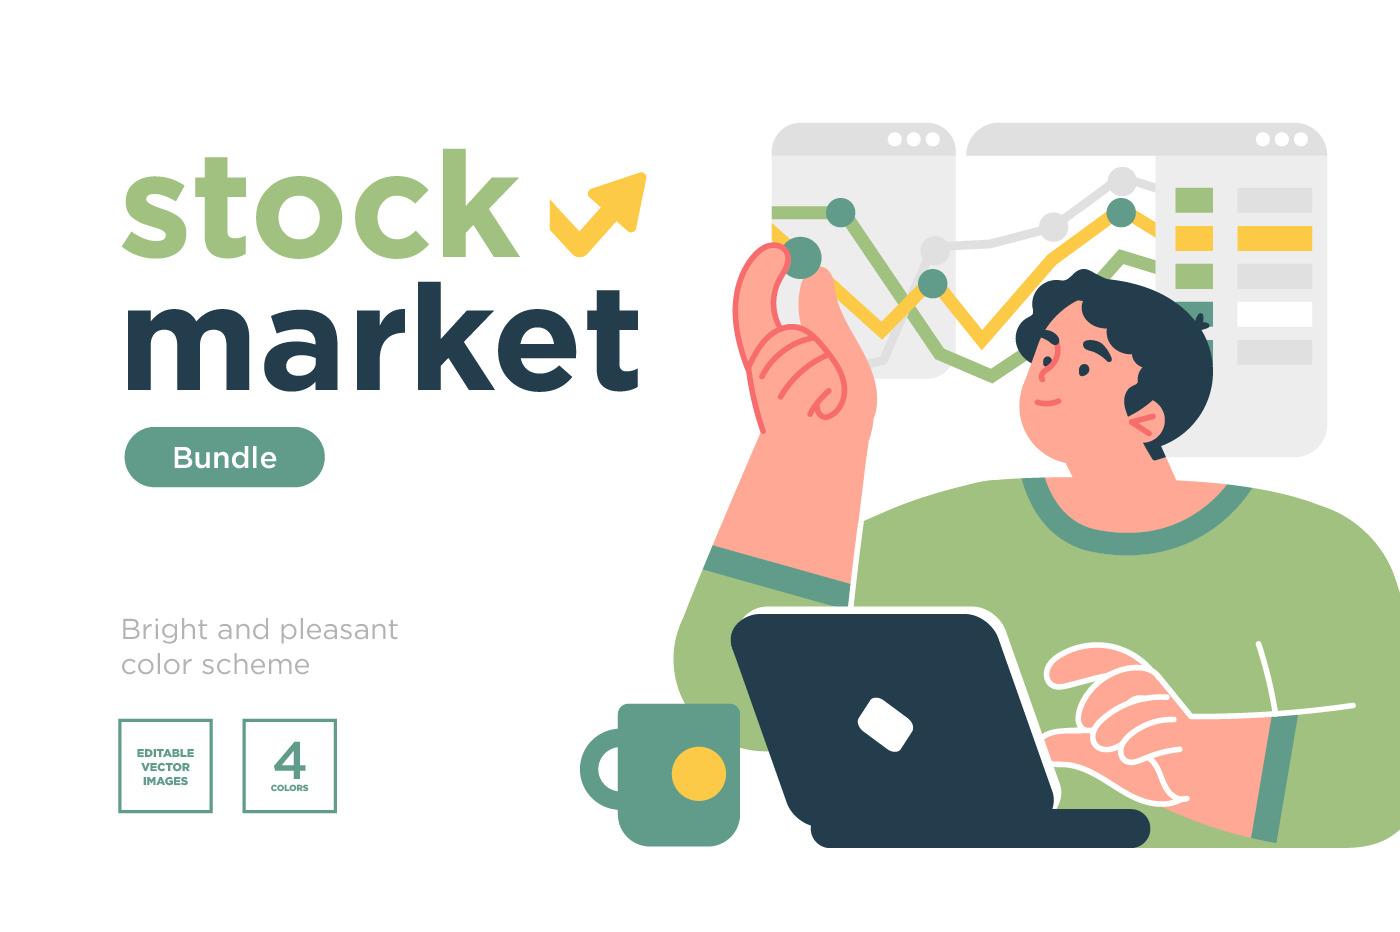 Stock trading, stakeholder, investment, analysis,  concepts illustration set.